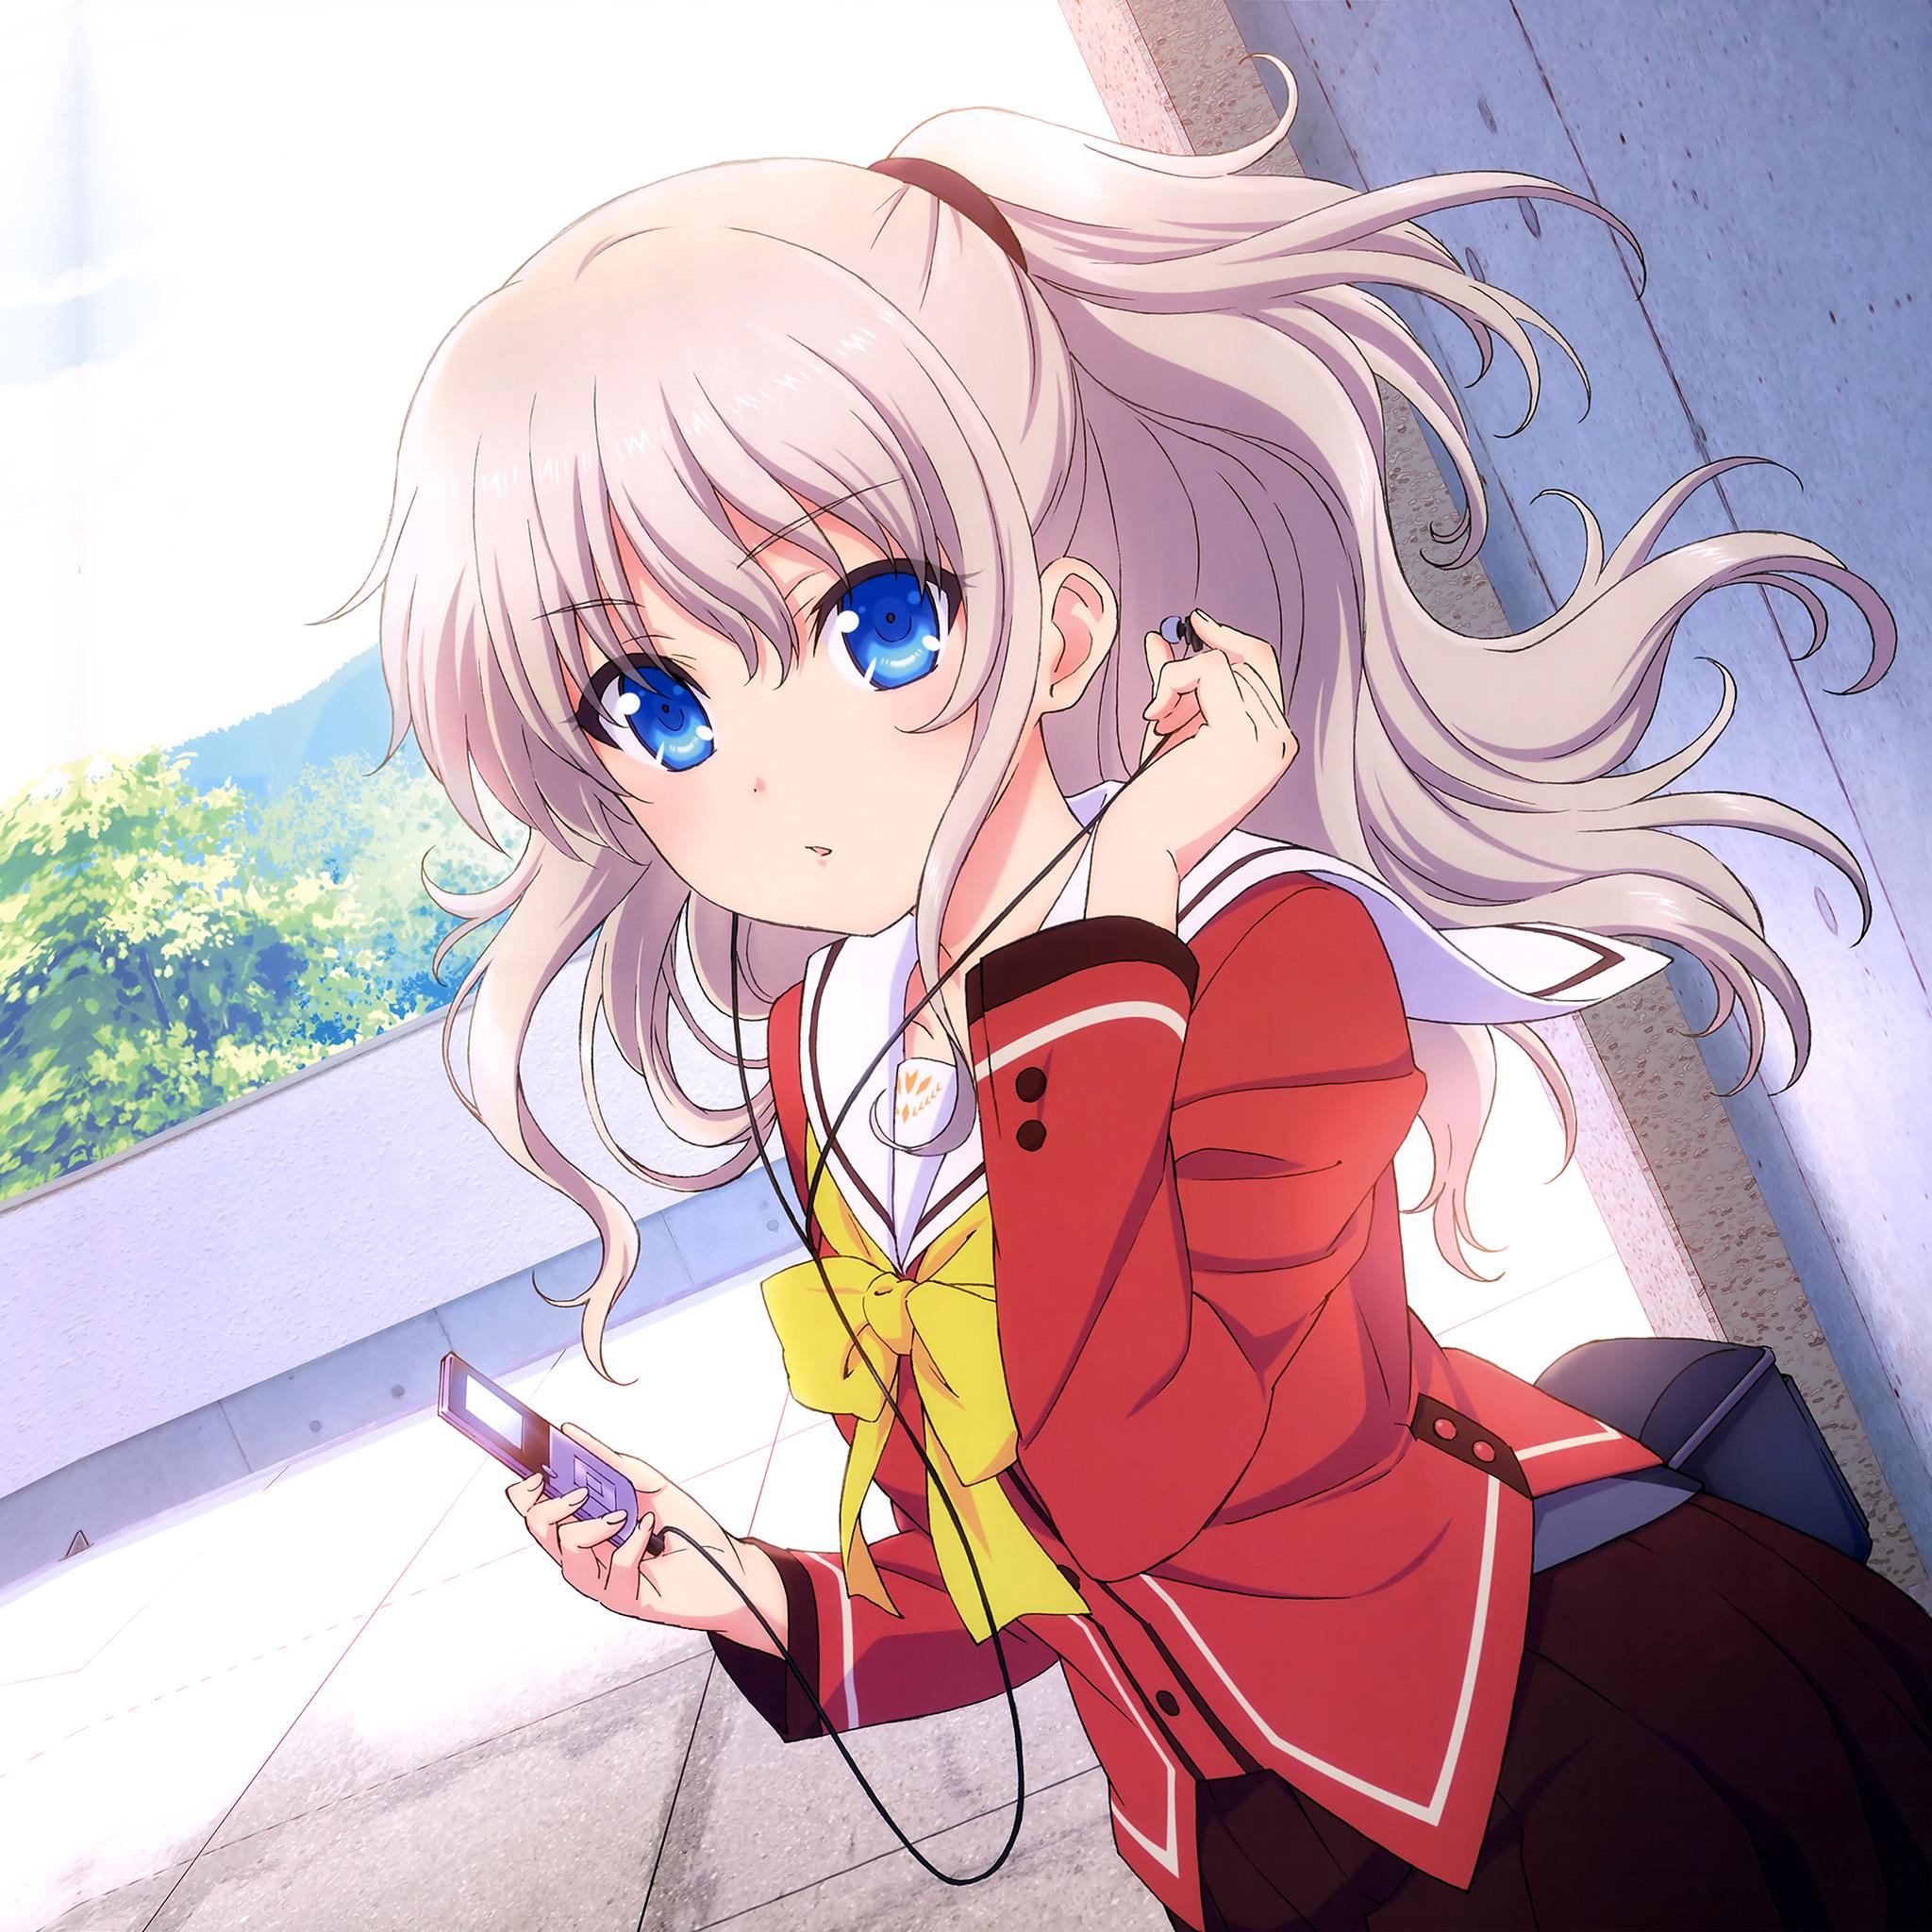 Aq87 chalorette anime girl cute art illustration wallpaper - Anime pretty girl wallpaper ...